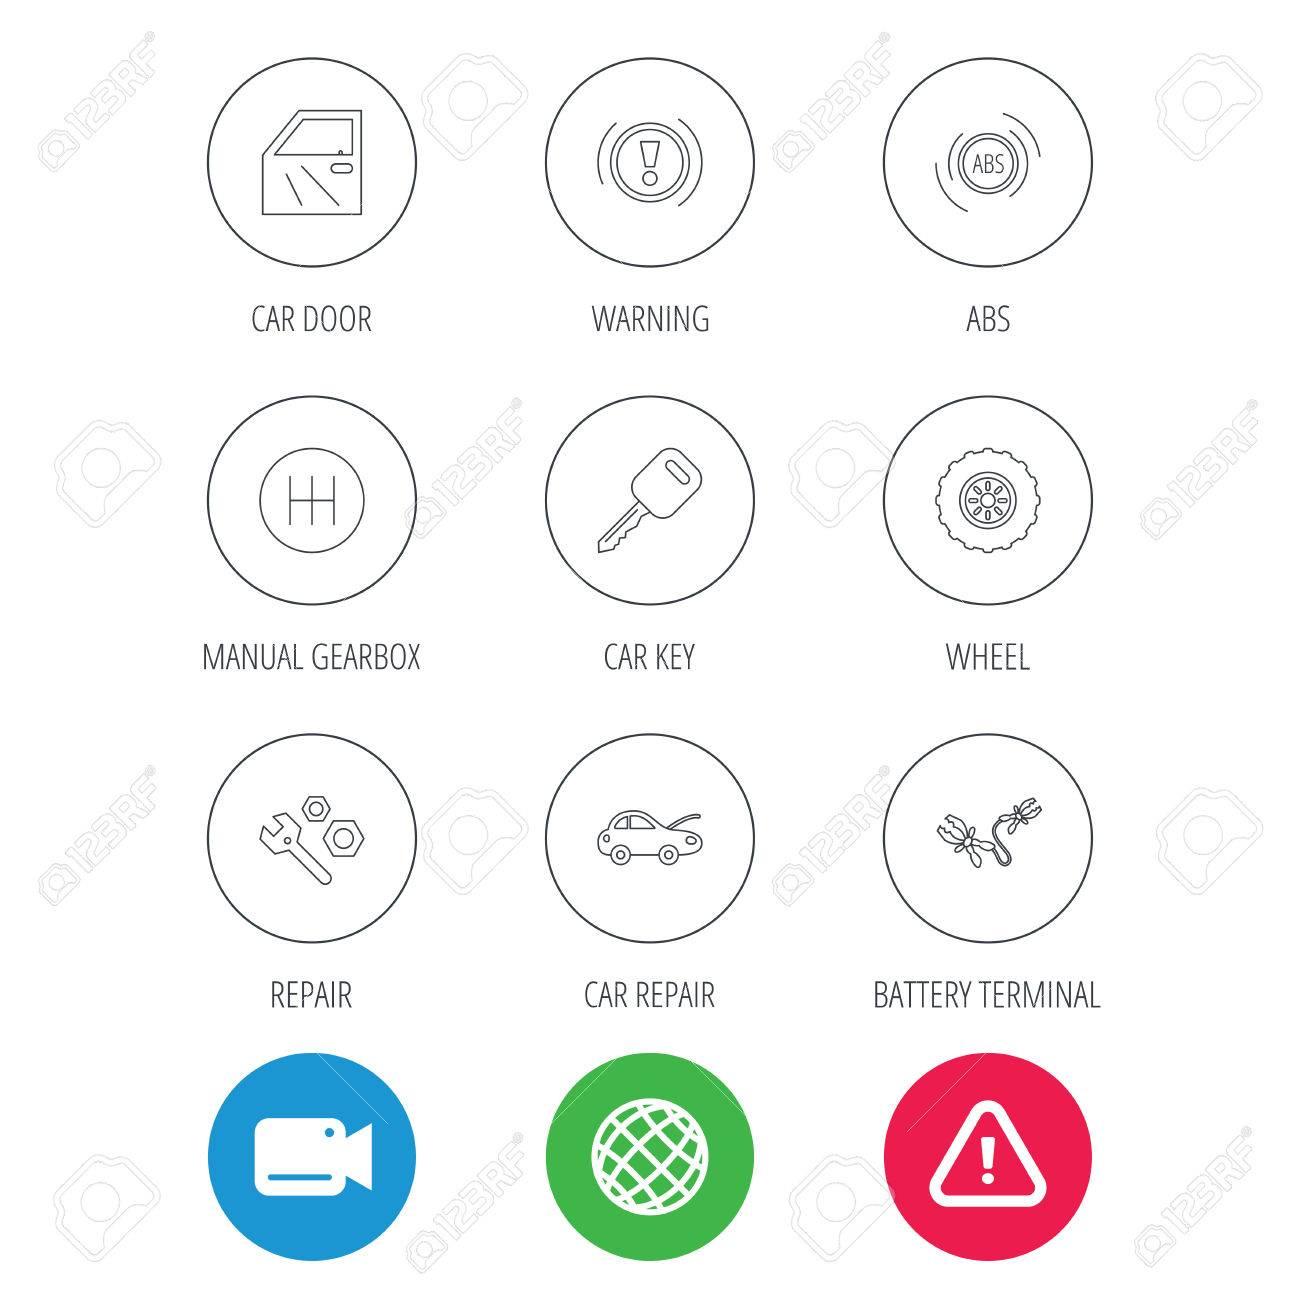 Car key, repair tools and manual gearbox icons  Wheel, warning